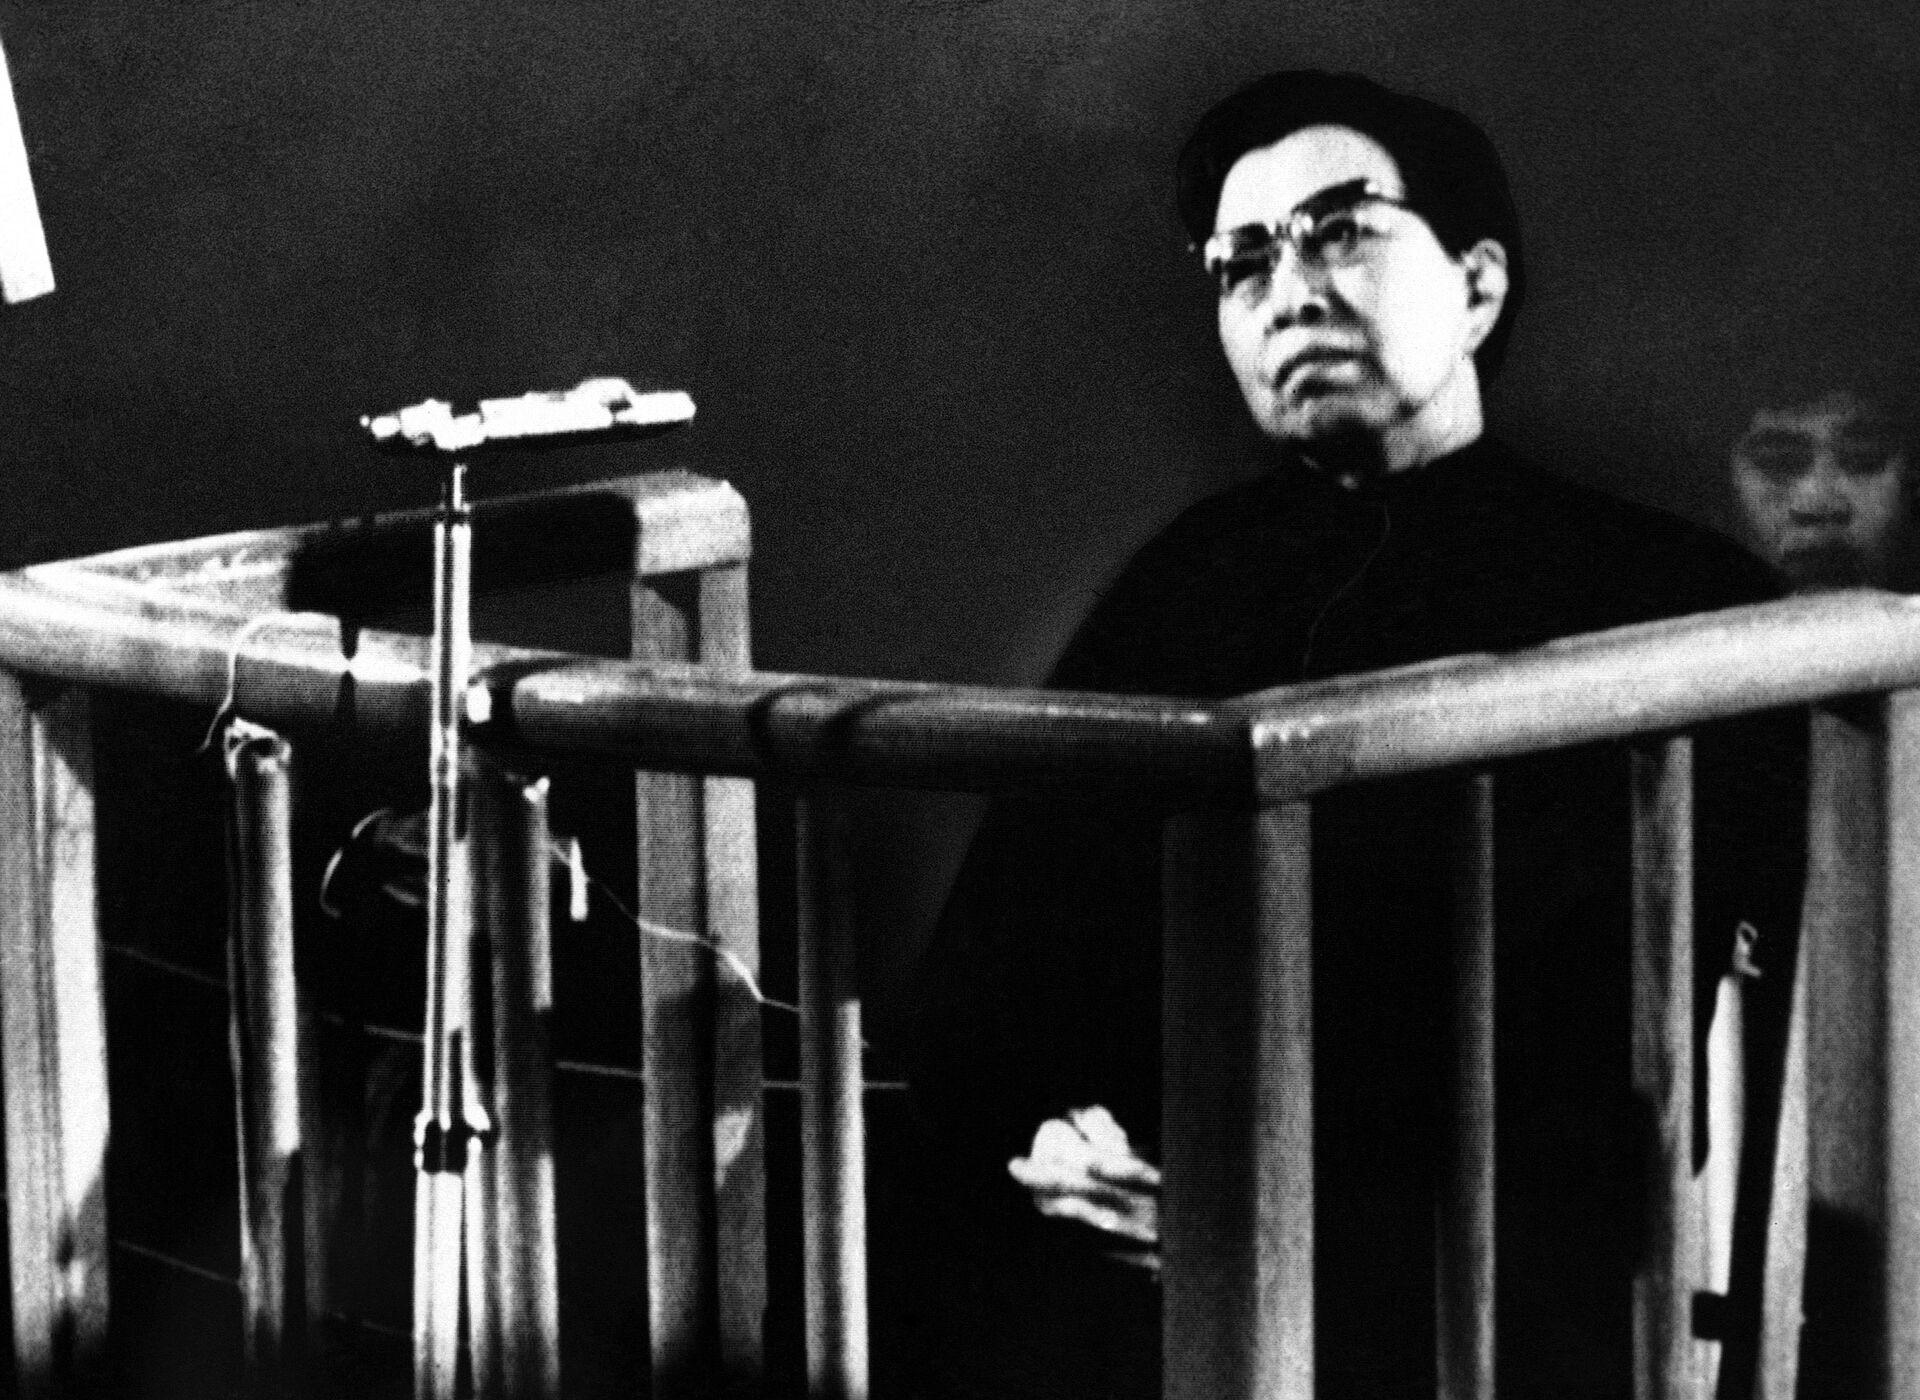 Вдова Мао Цзэдуна Цзян Цин во время суда в Пекине. 26 ноября 1980 года  - РИА Новости, 1920, 08.09.2021